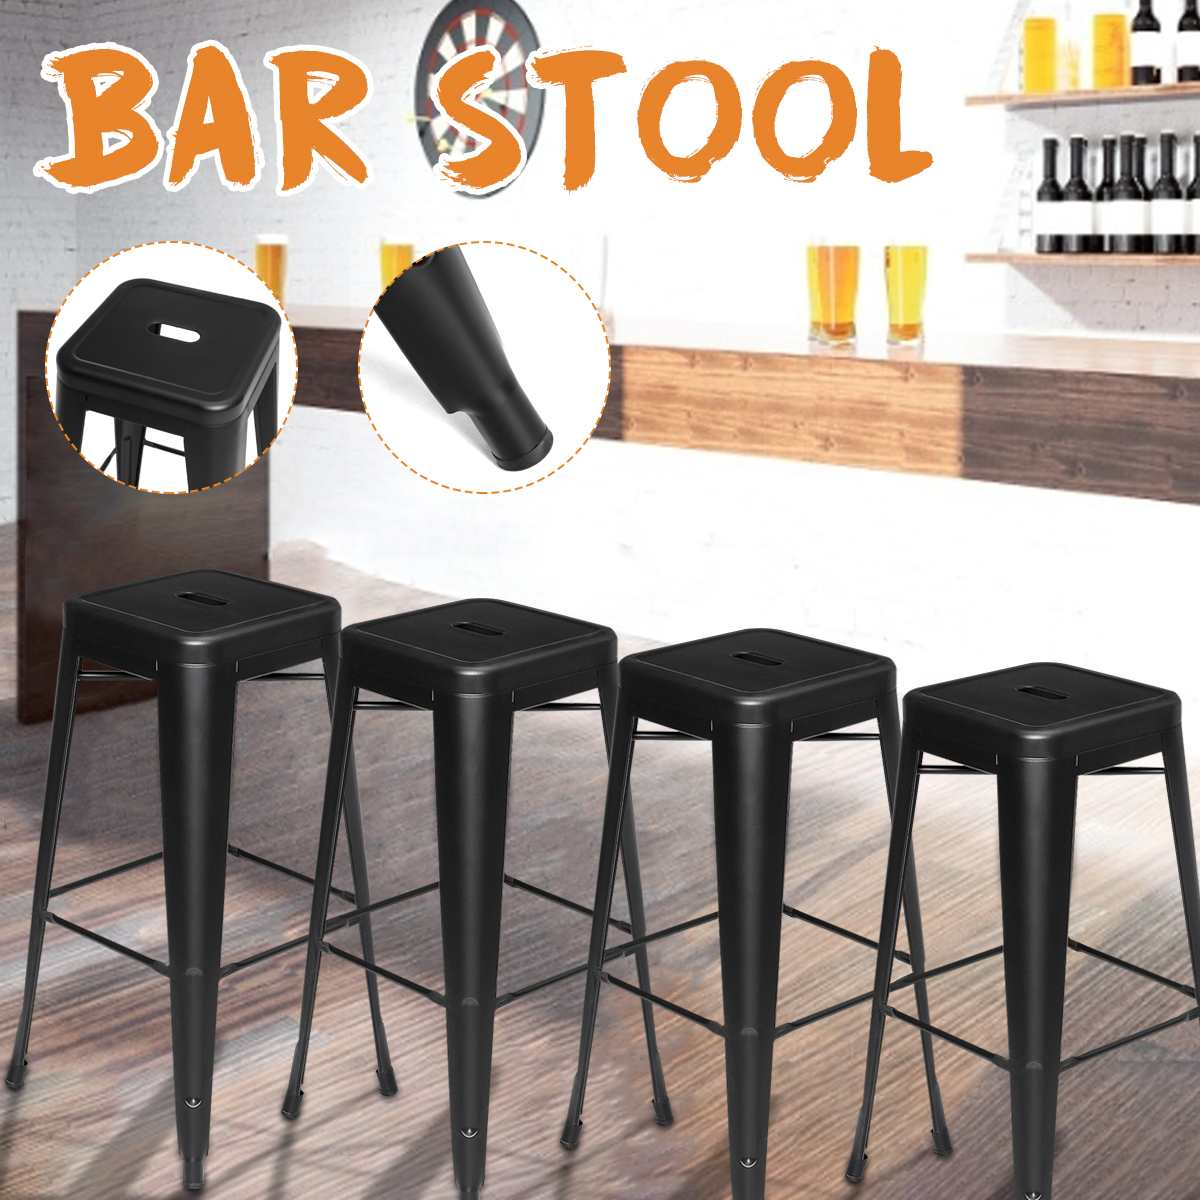 4 PCS Modern Wrought Iron Bar Chair Black Metal Nordic Bar Stool  Fashion High Stool Dining Chair For Bar Home Kitchen